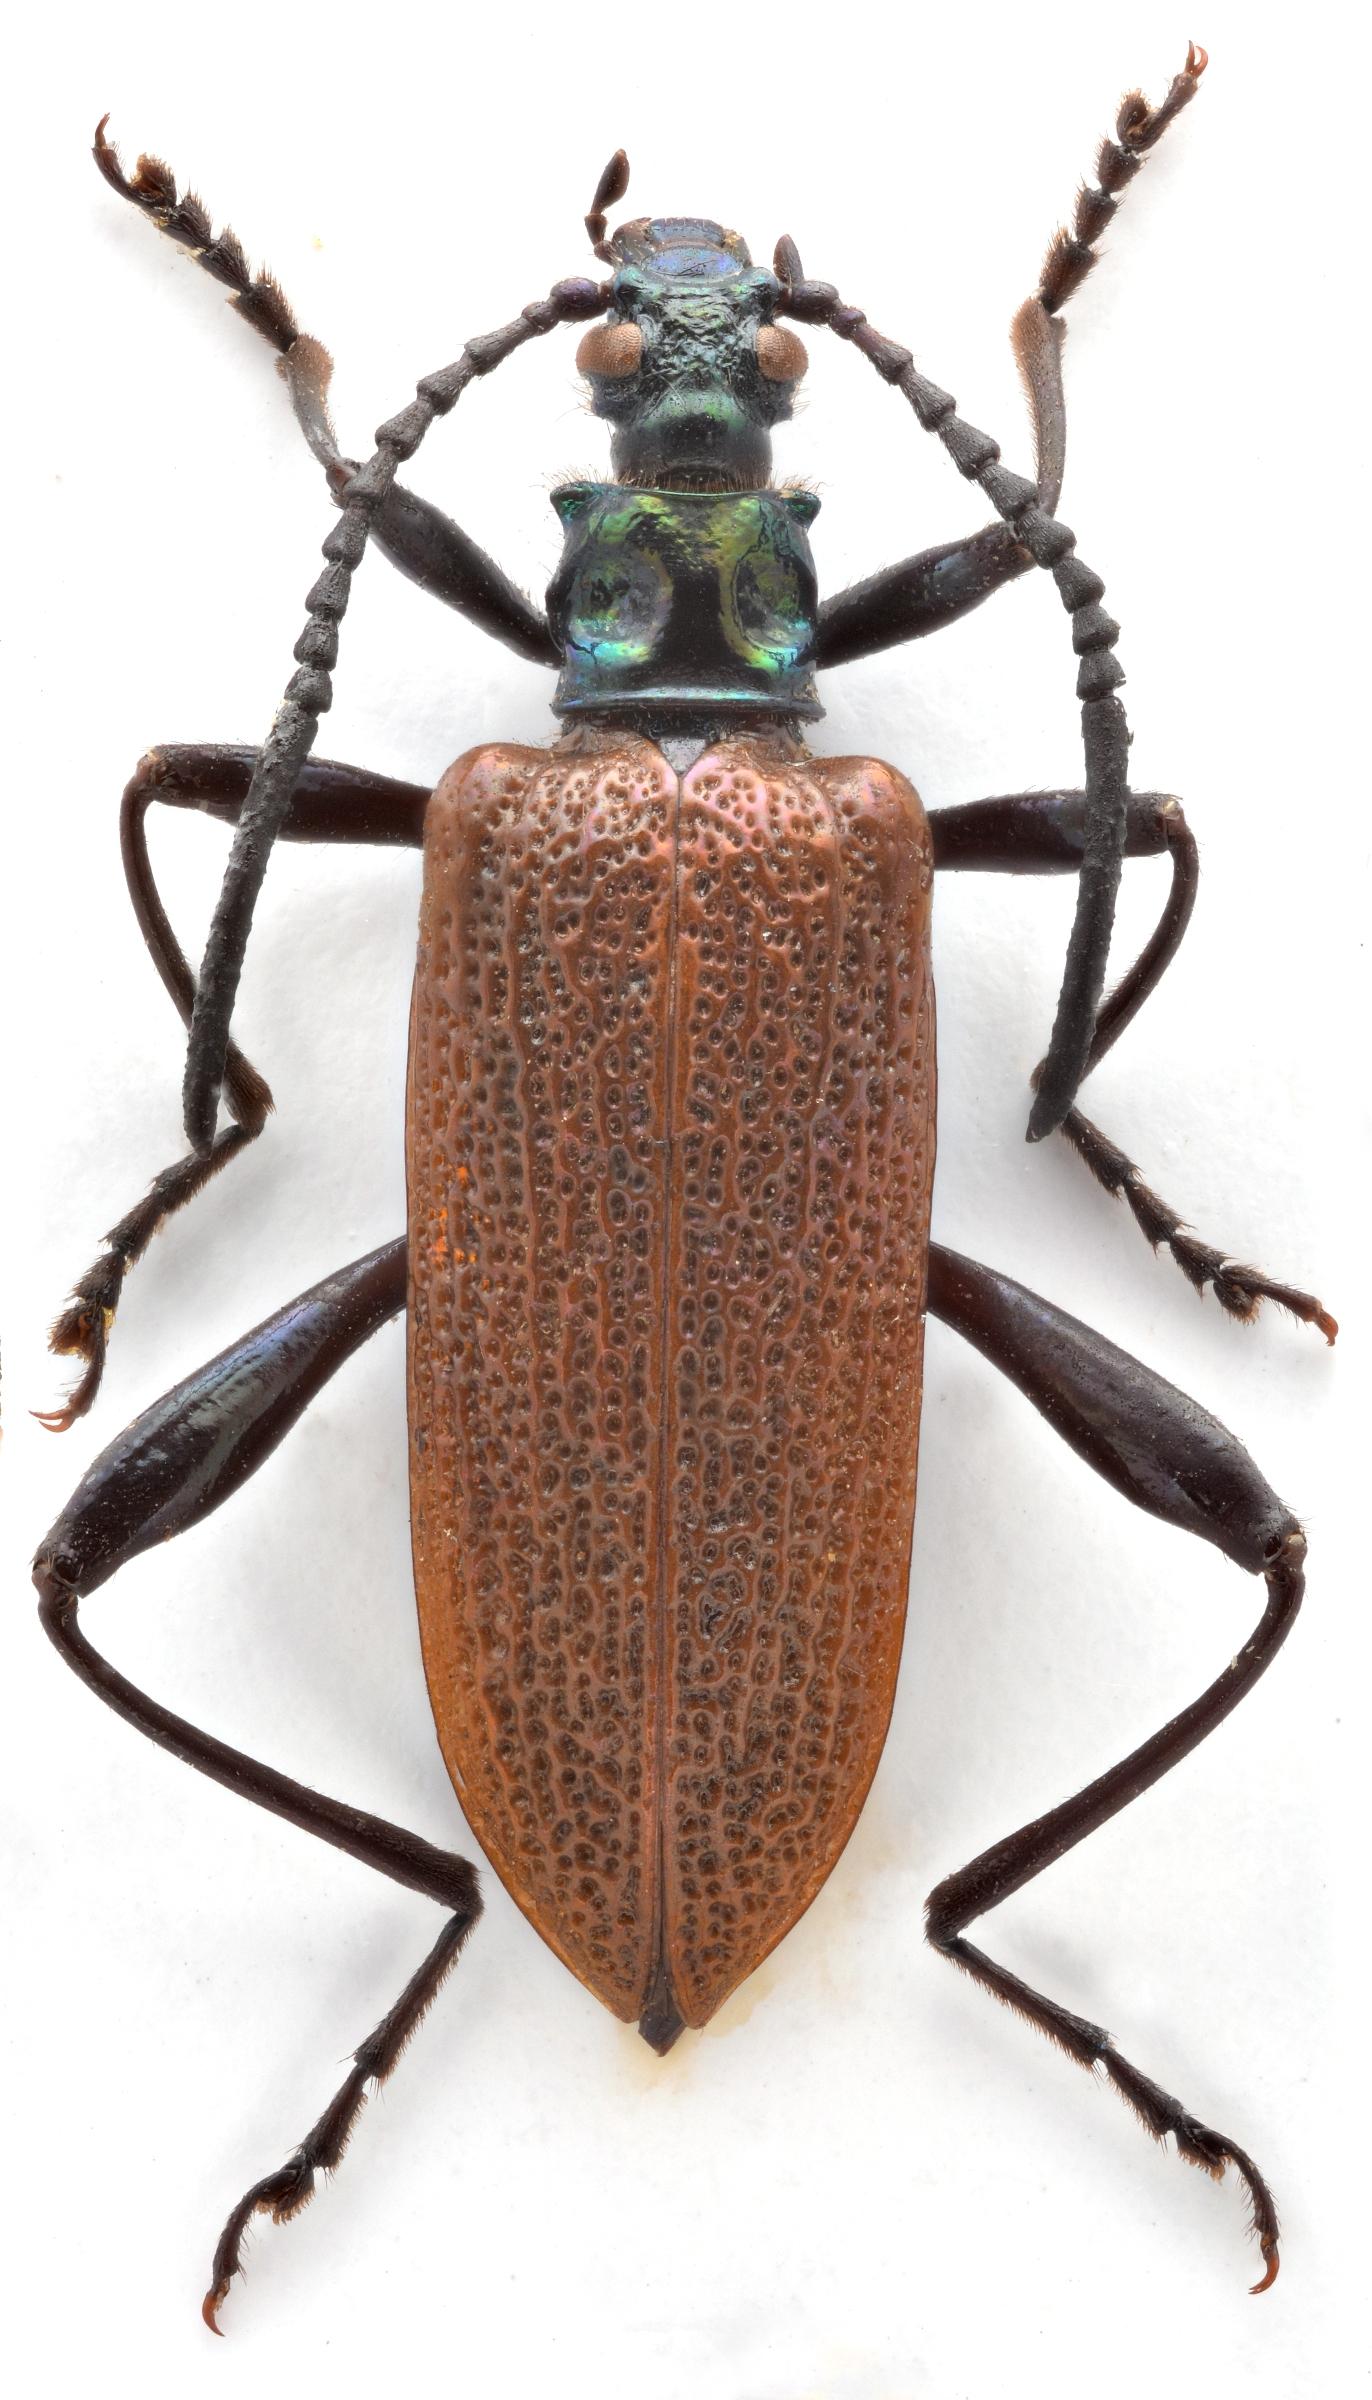 donaciolagria_medvedevi_male_holotype_kicsi.jpg